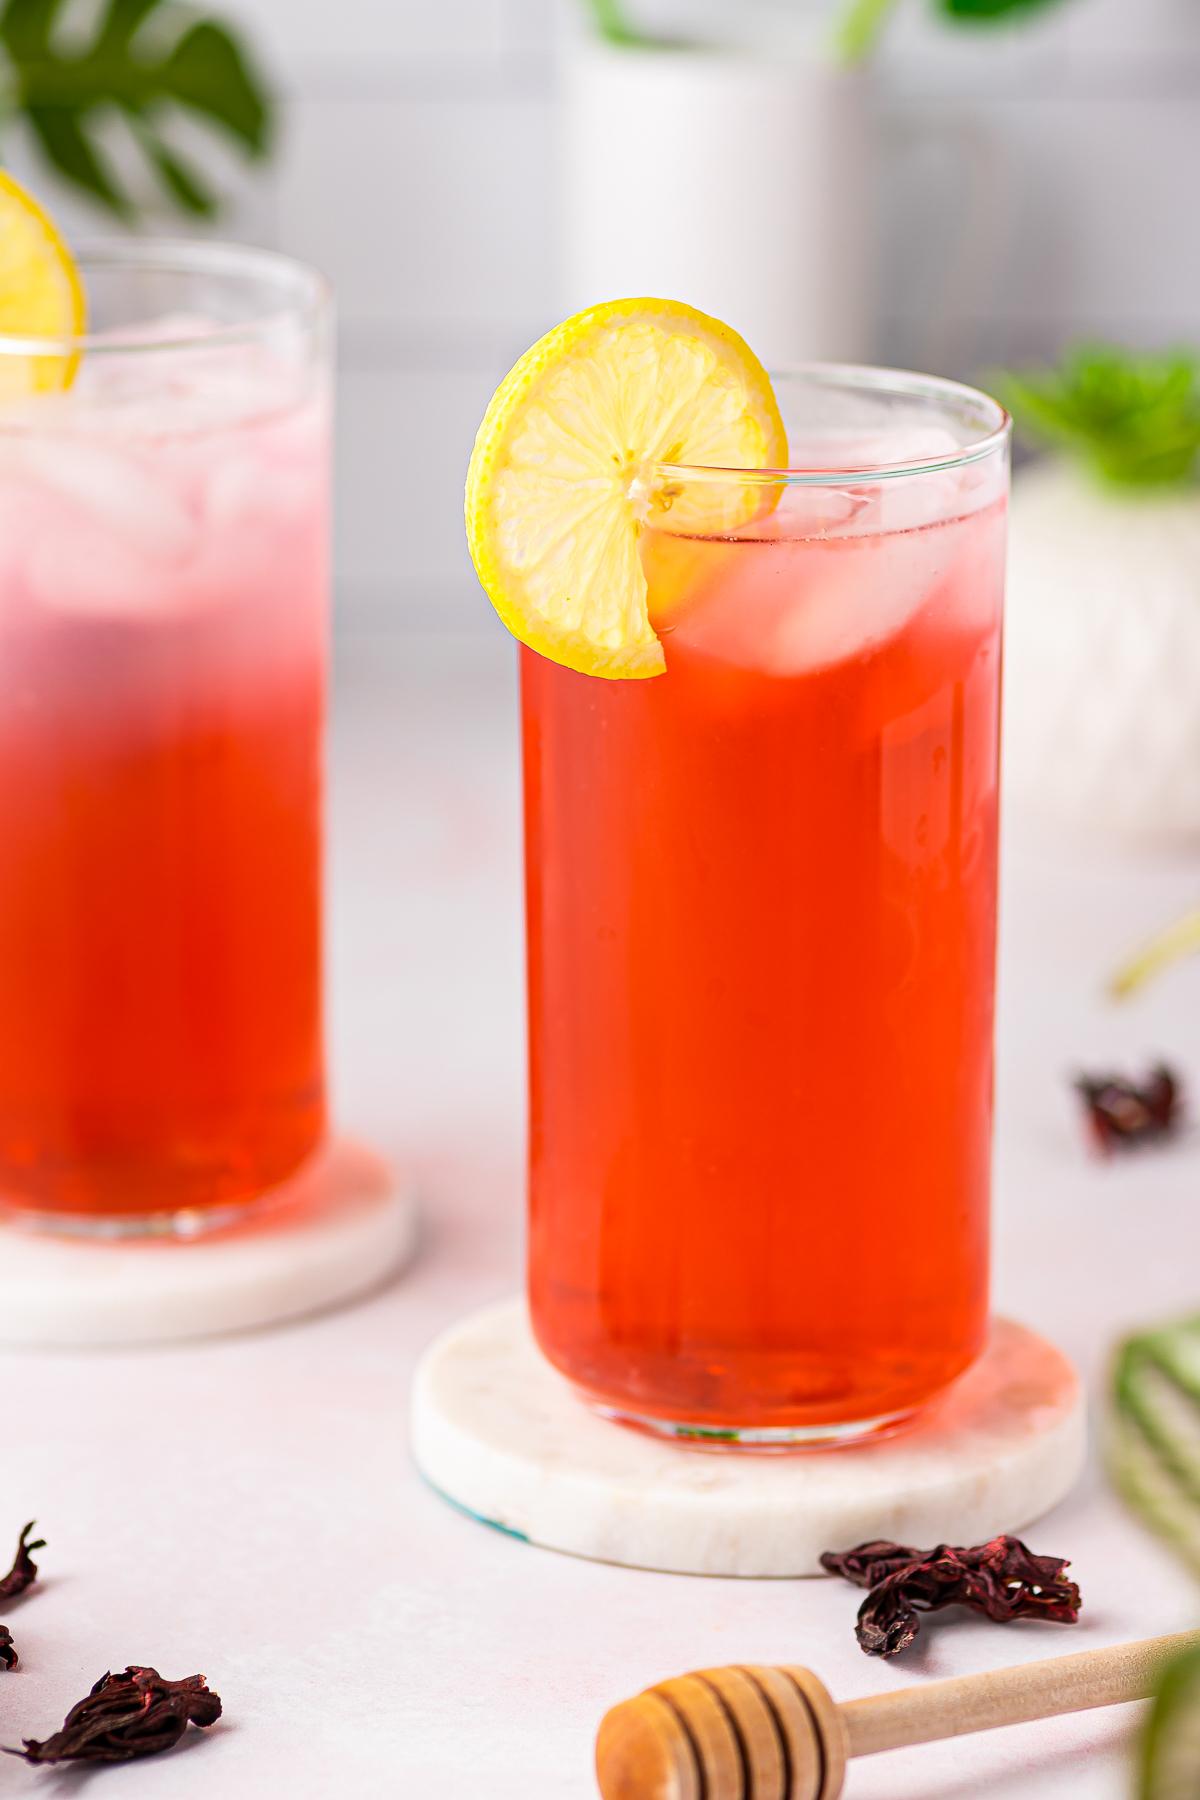 Glass of Hibiscus Tea Recipe garnished with slice of lemon